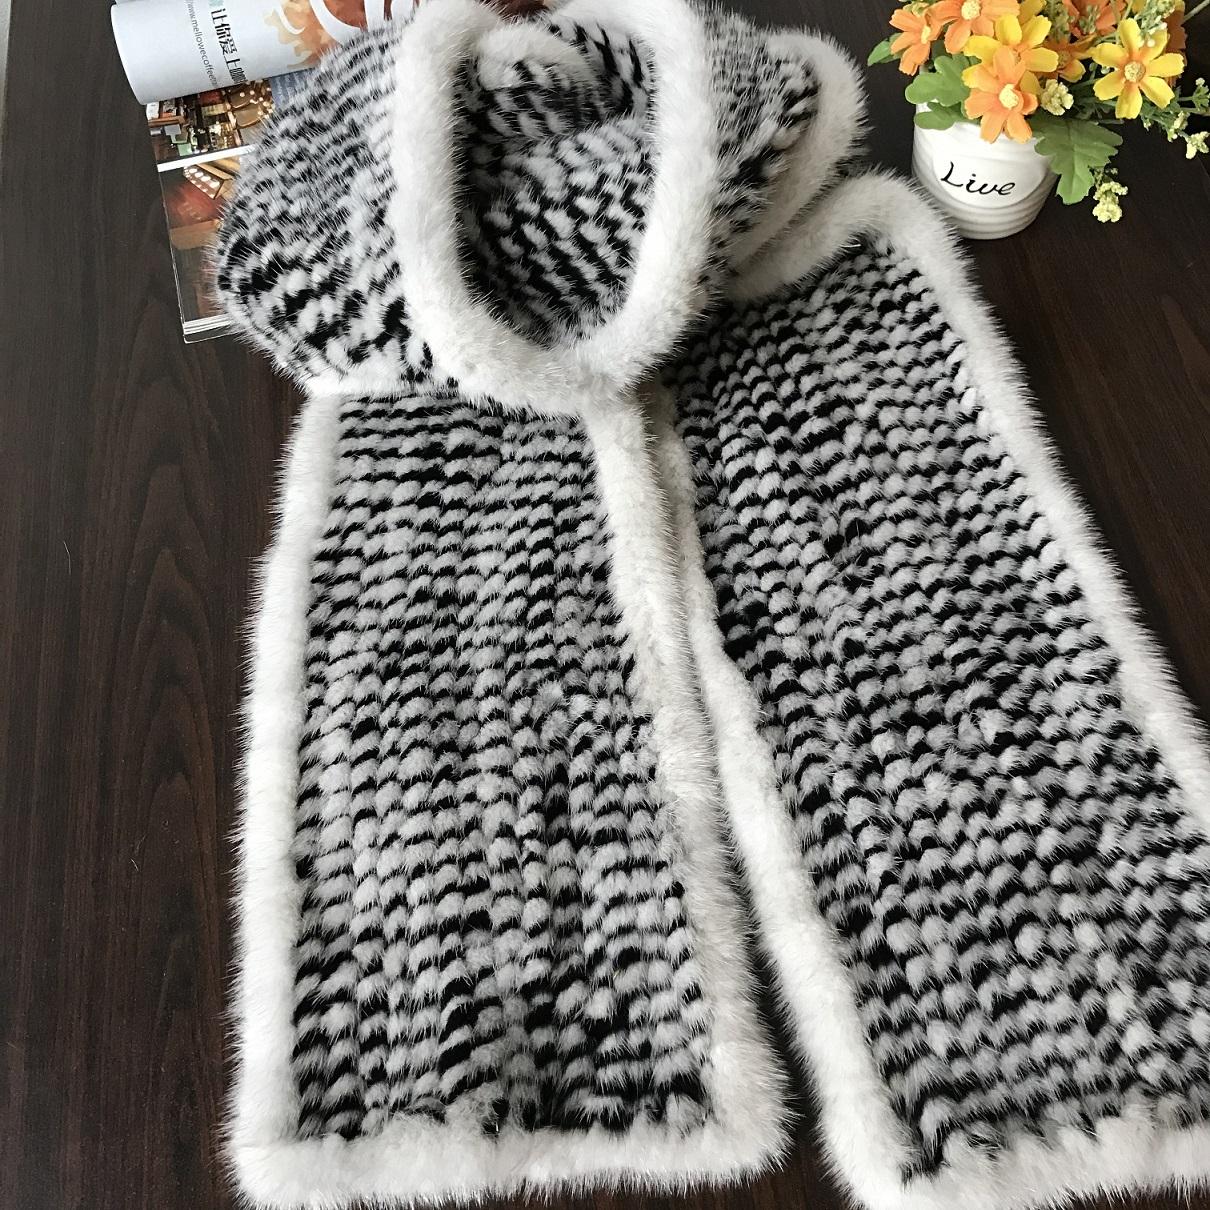 Mink Fur Scarf made by European quality mink fur